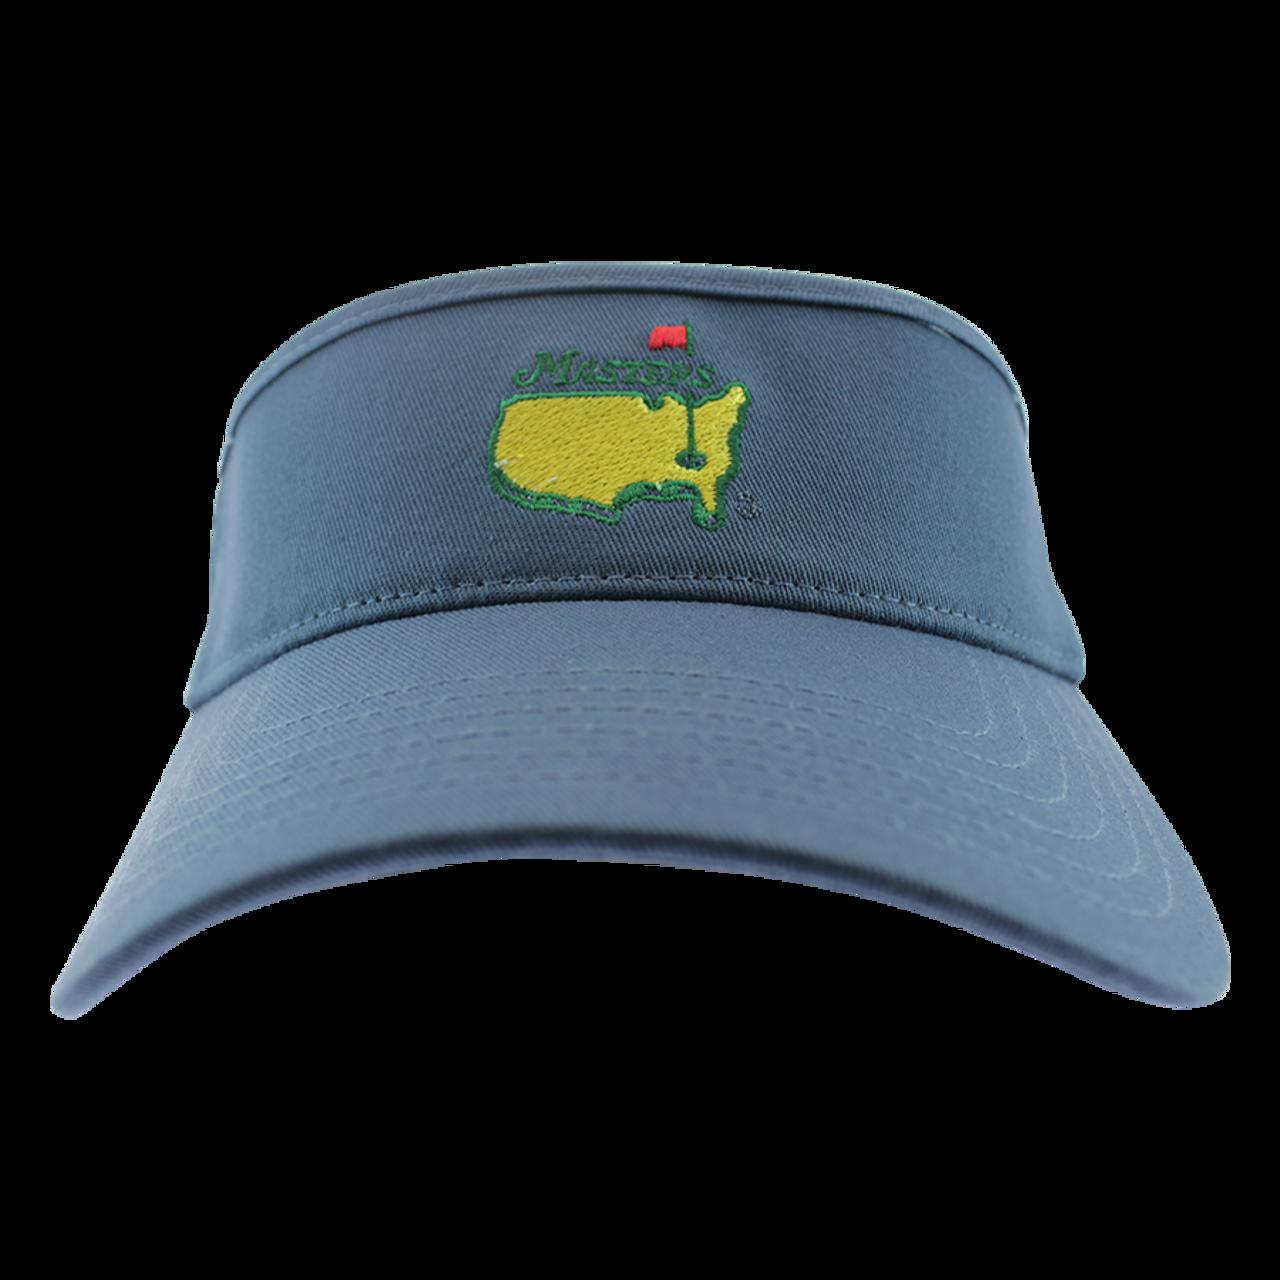 de44180b5907c 2019 Masters Green Alternate Logo Caddy Hat